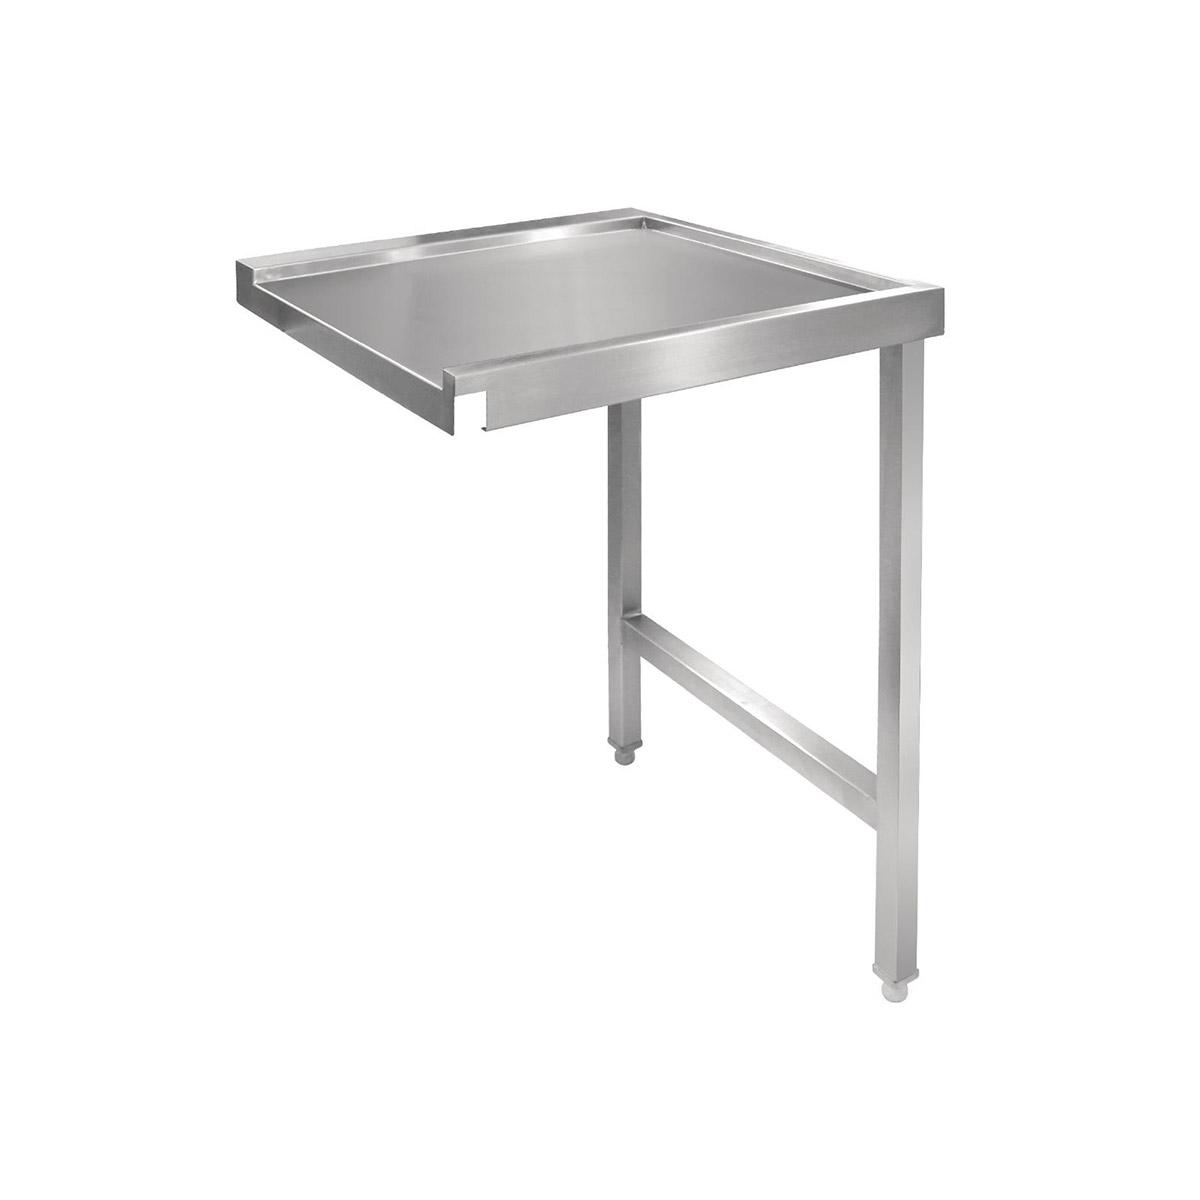 Vogue Pass Through Dishwash Table Right 650(D)mm